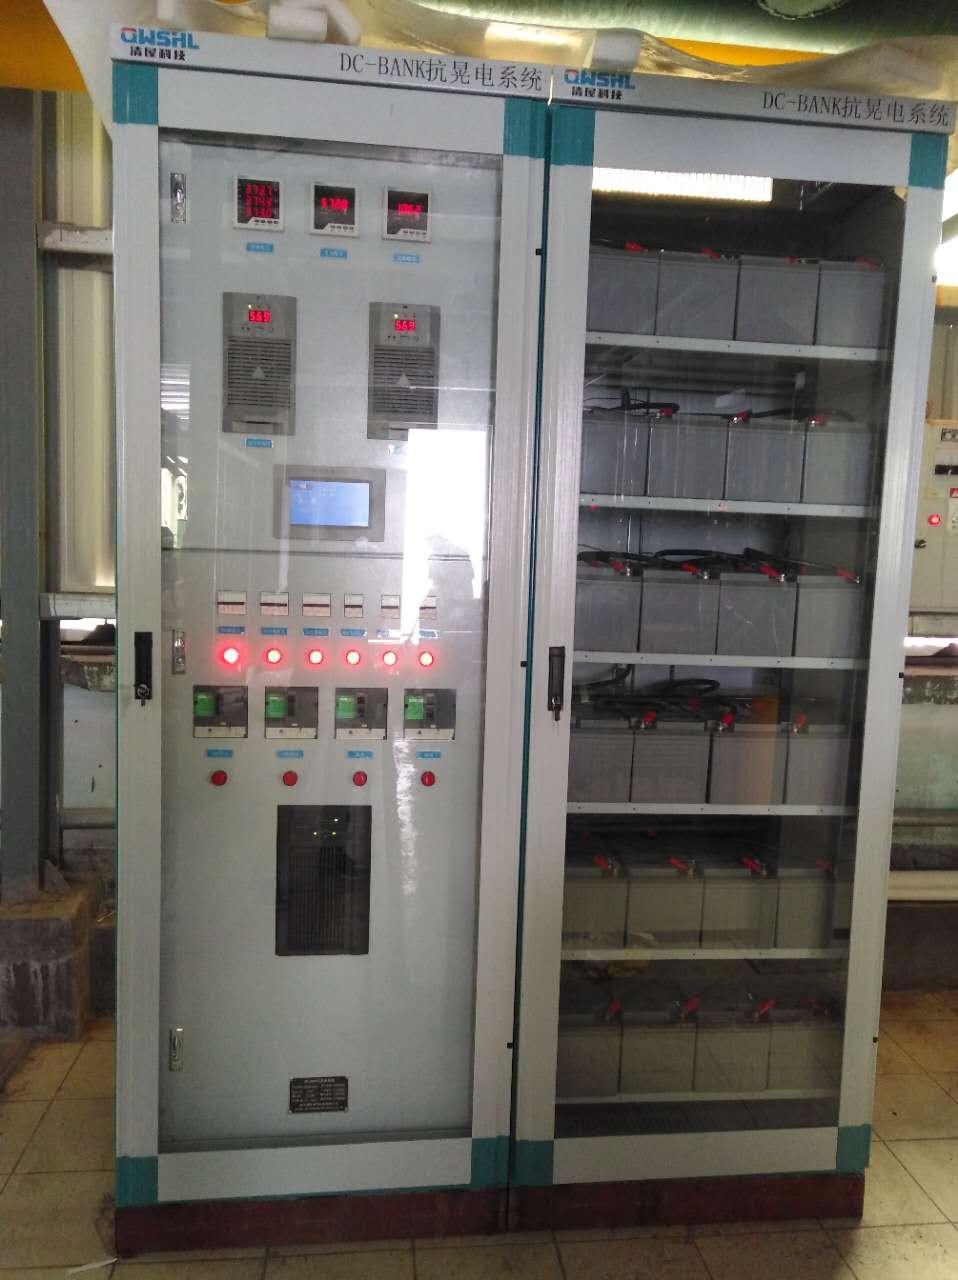 DC-BANK,变频器低压支撑系统,动力不间断电源系统